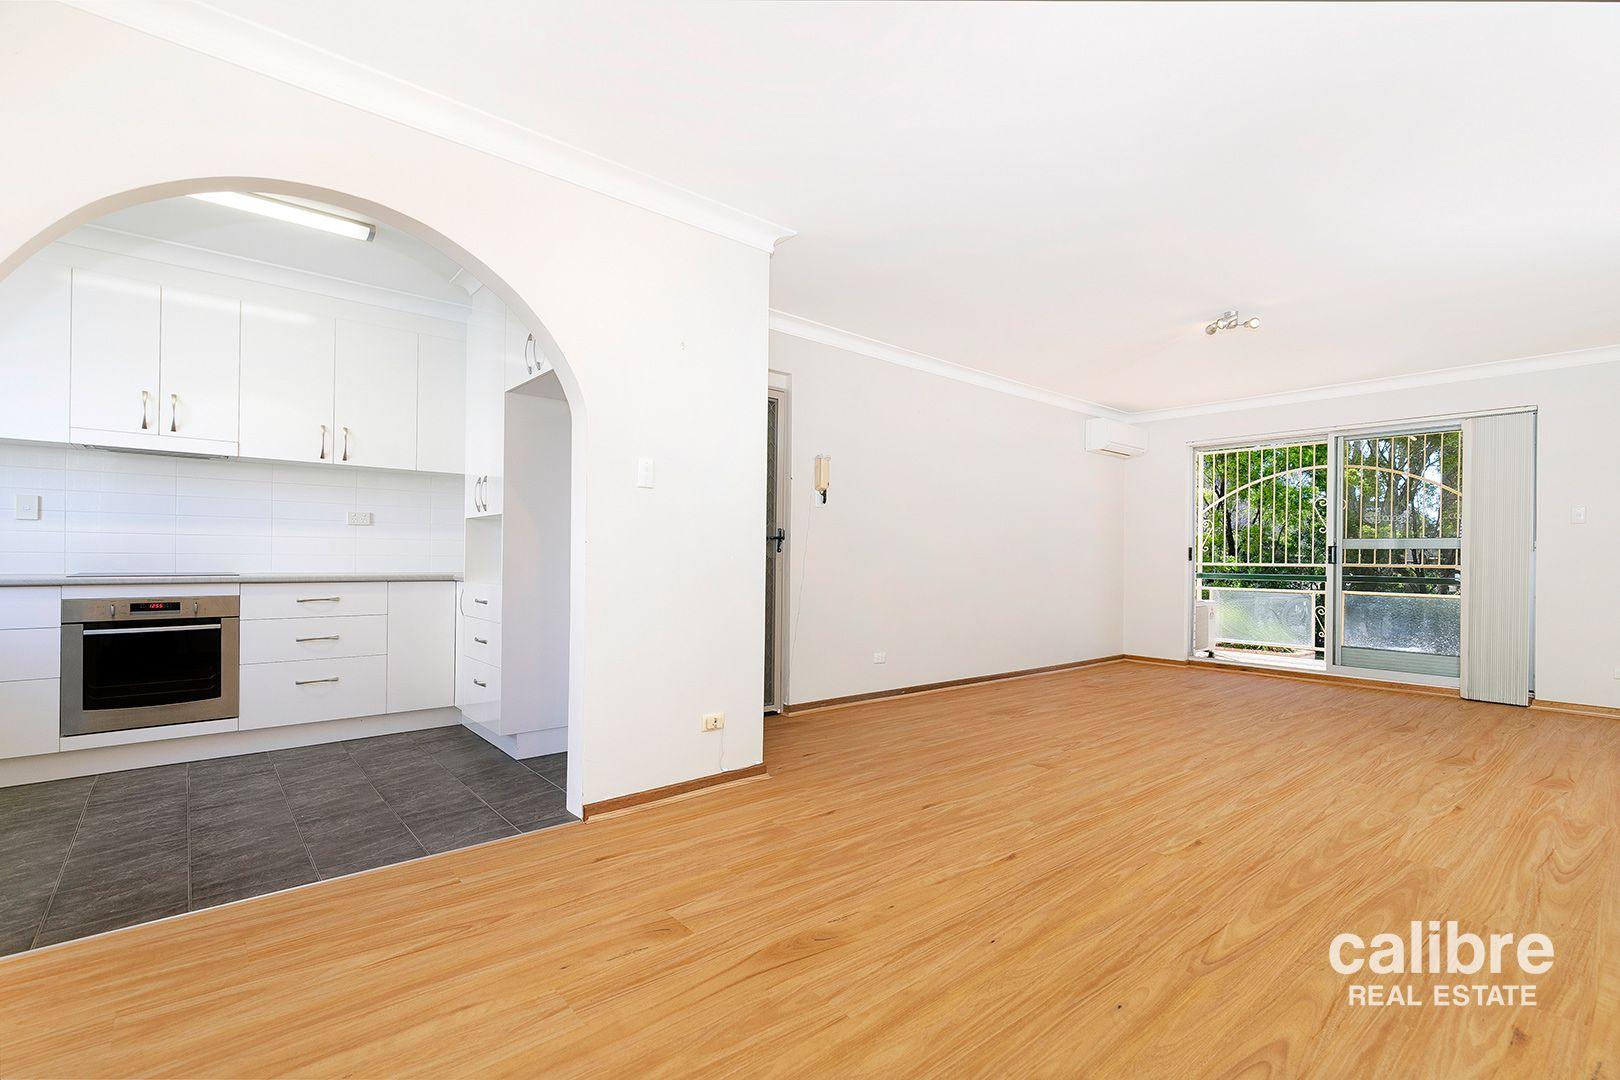 1/34 Lade Street, Gaythorne QLD 4051, Image 1